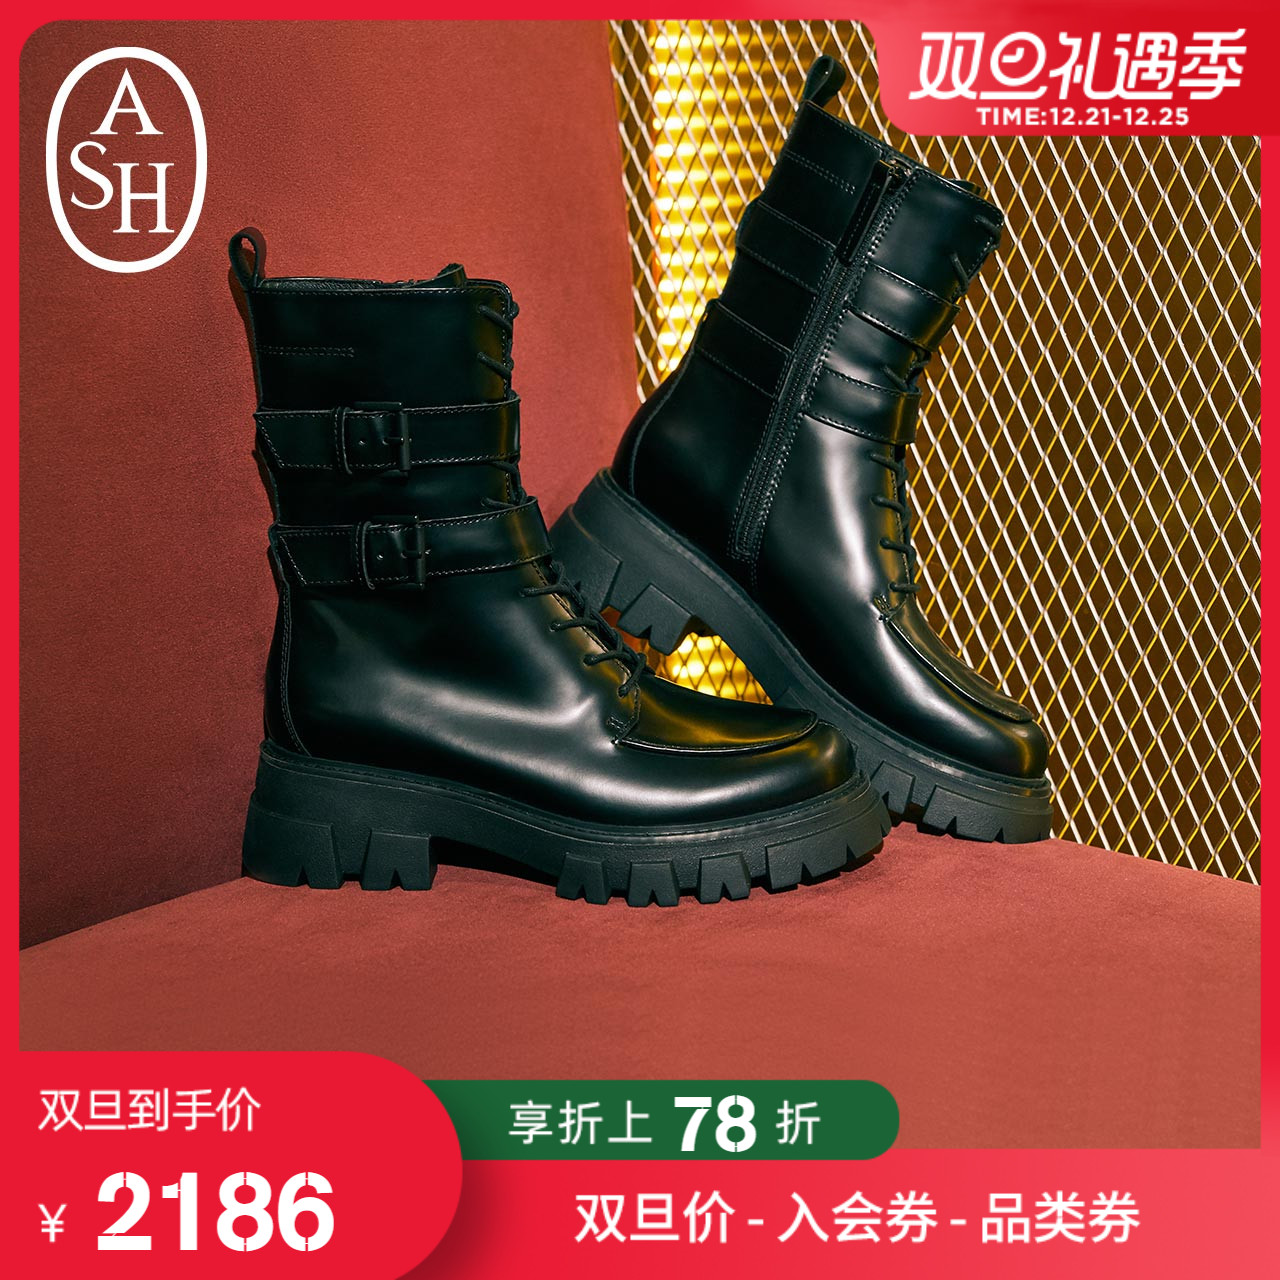 ASH女鞋2020冬季新款LARS系列潮流厚底增高单靴拉链中筒靴马丁靴 【在售价】3098.00 元 【券后价】2898.00元 ----------------- 【立即领券】点击链接即可领券购买: